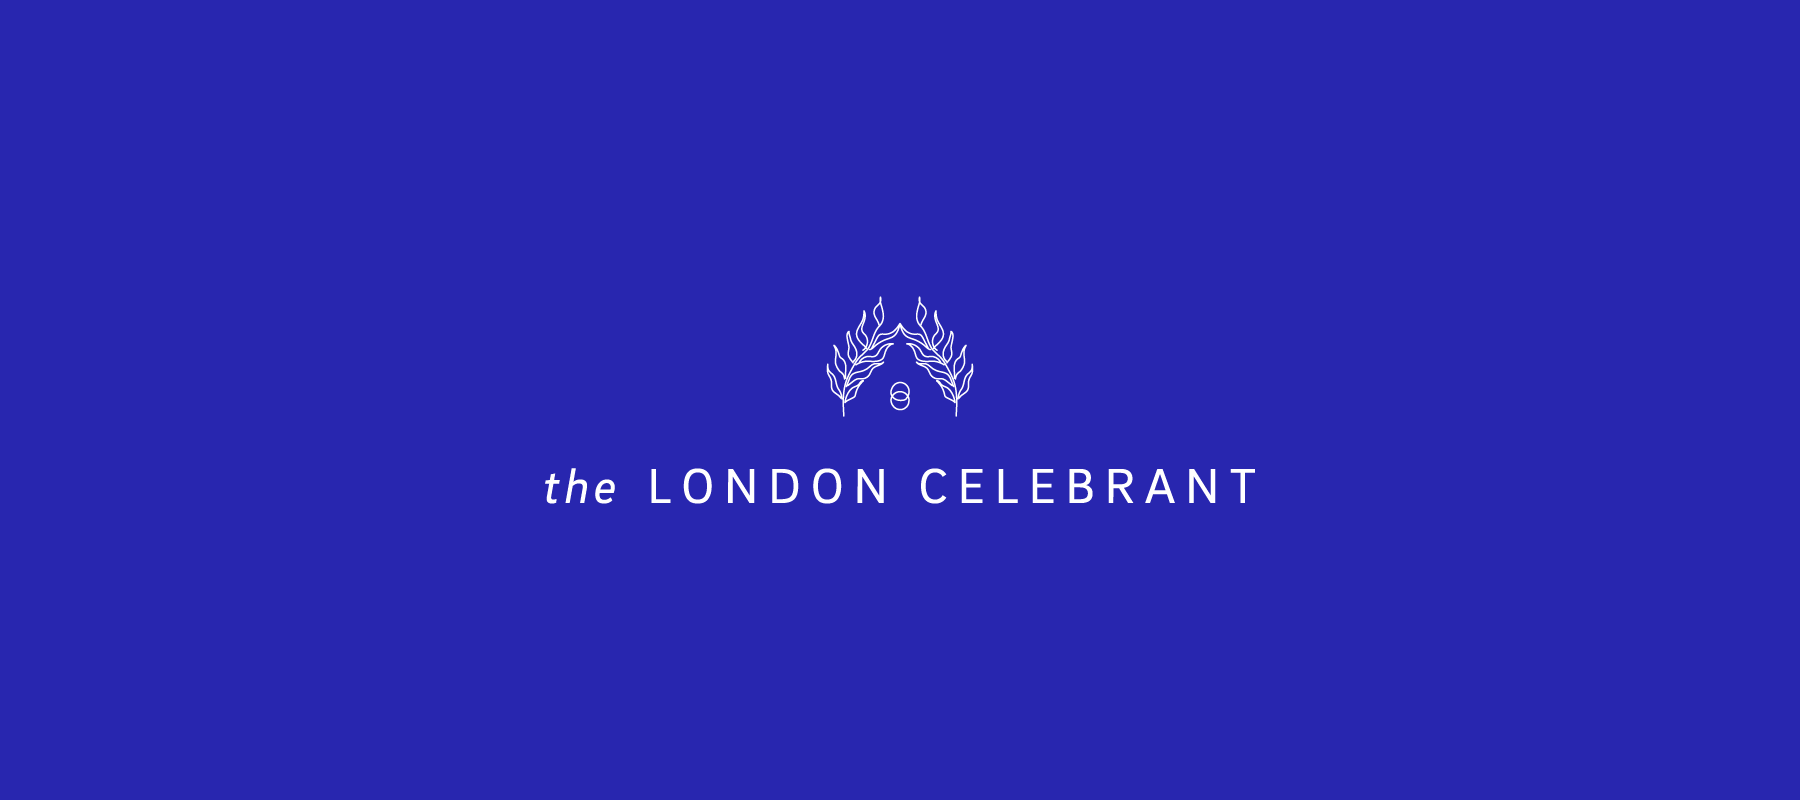 perks.design_the-london-celebrant_logo.png